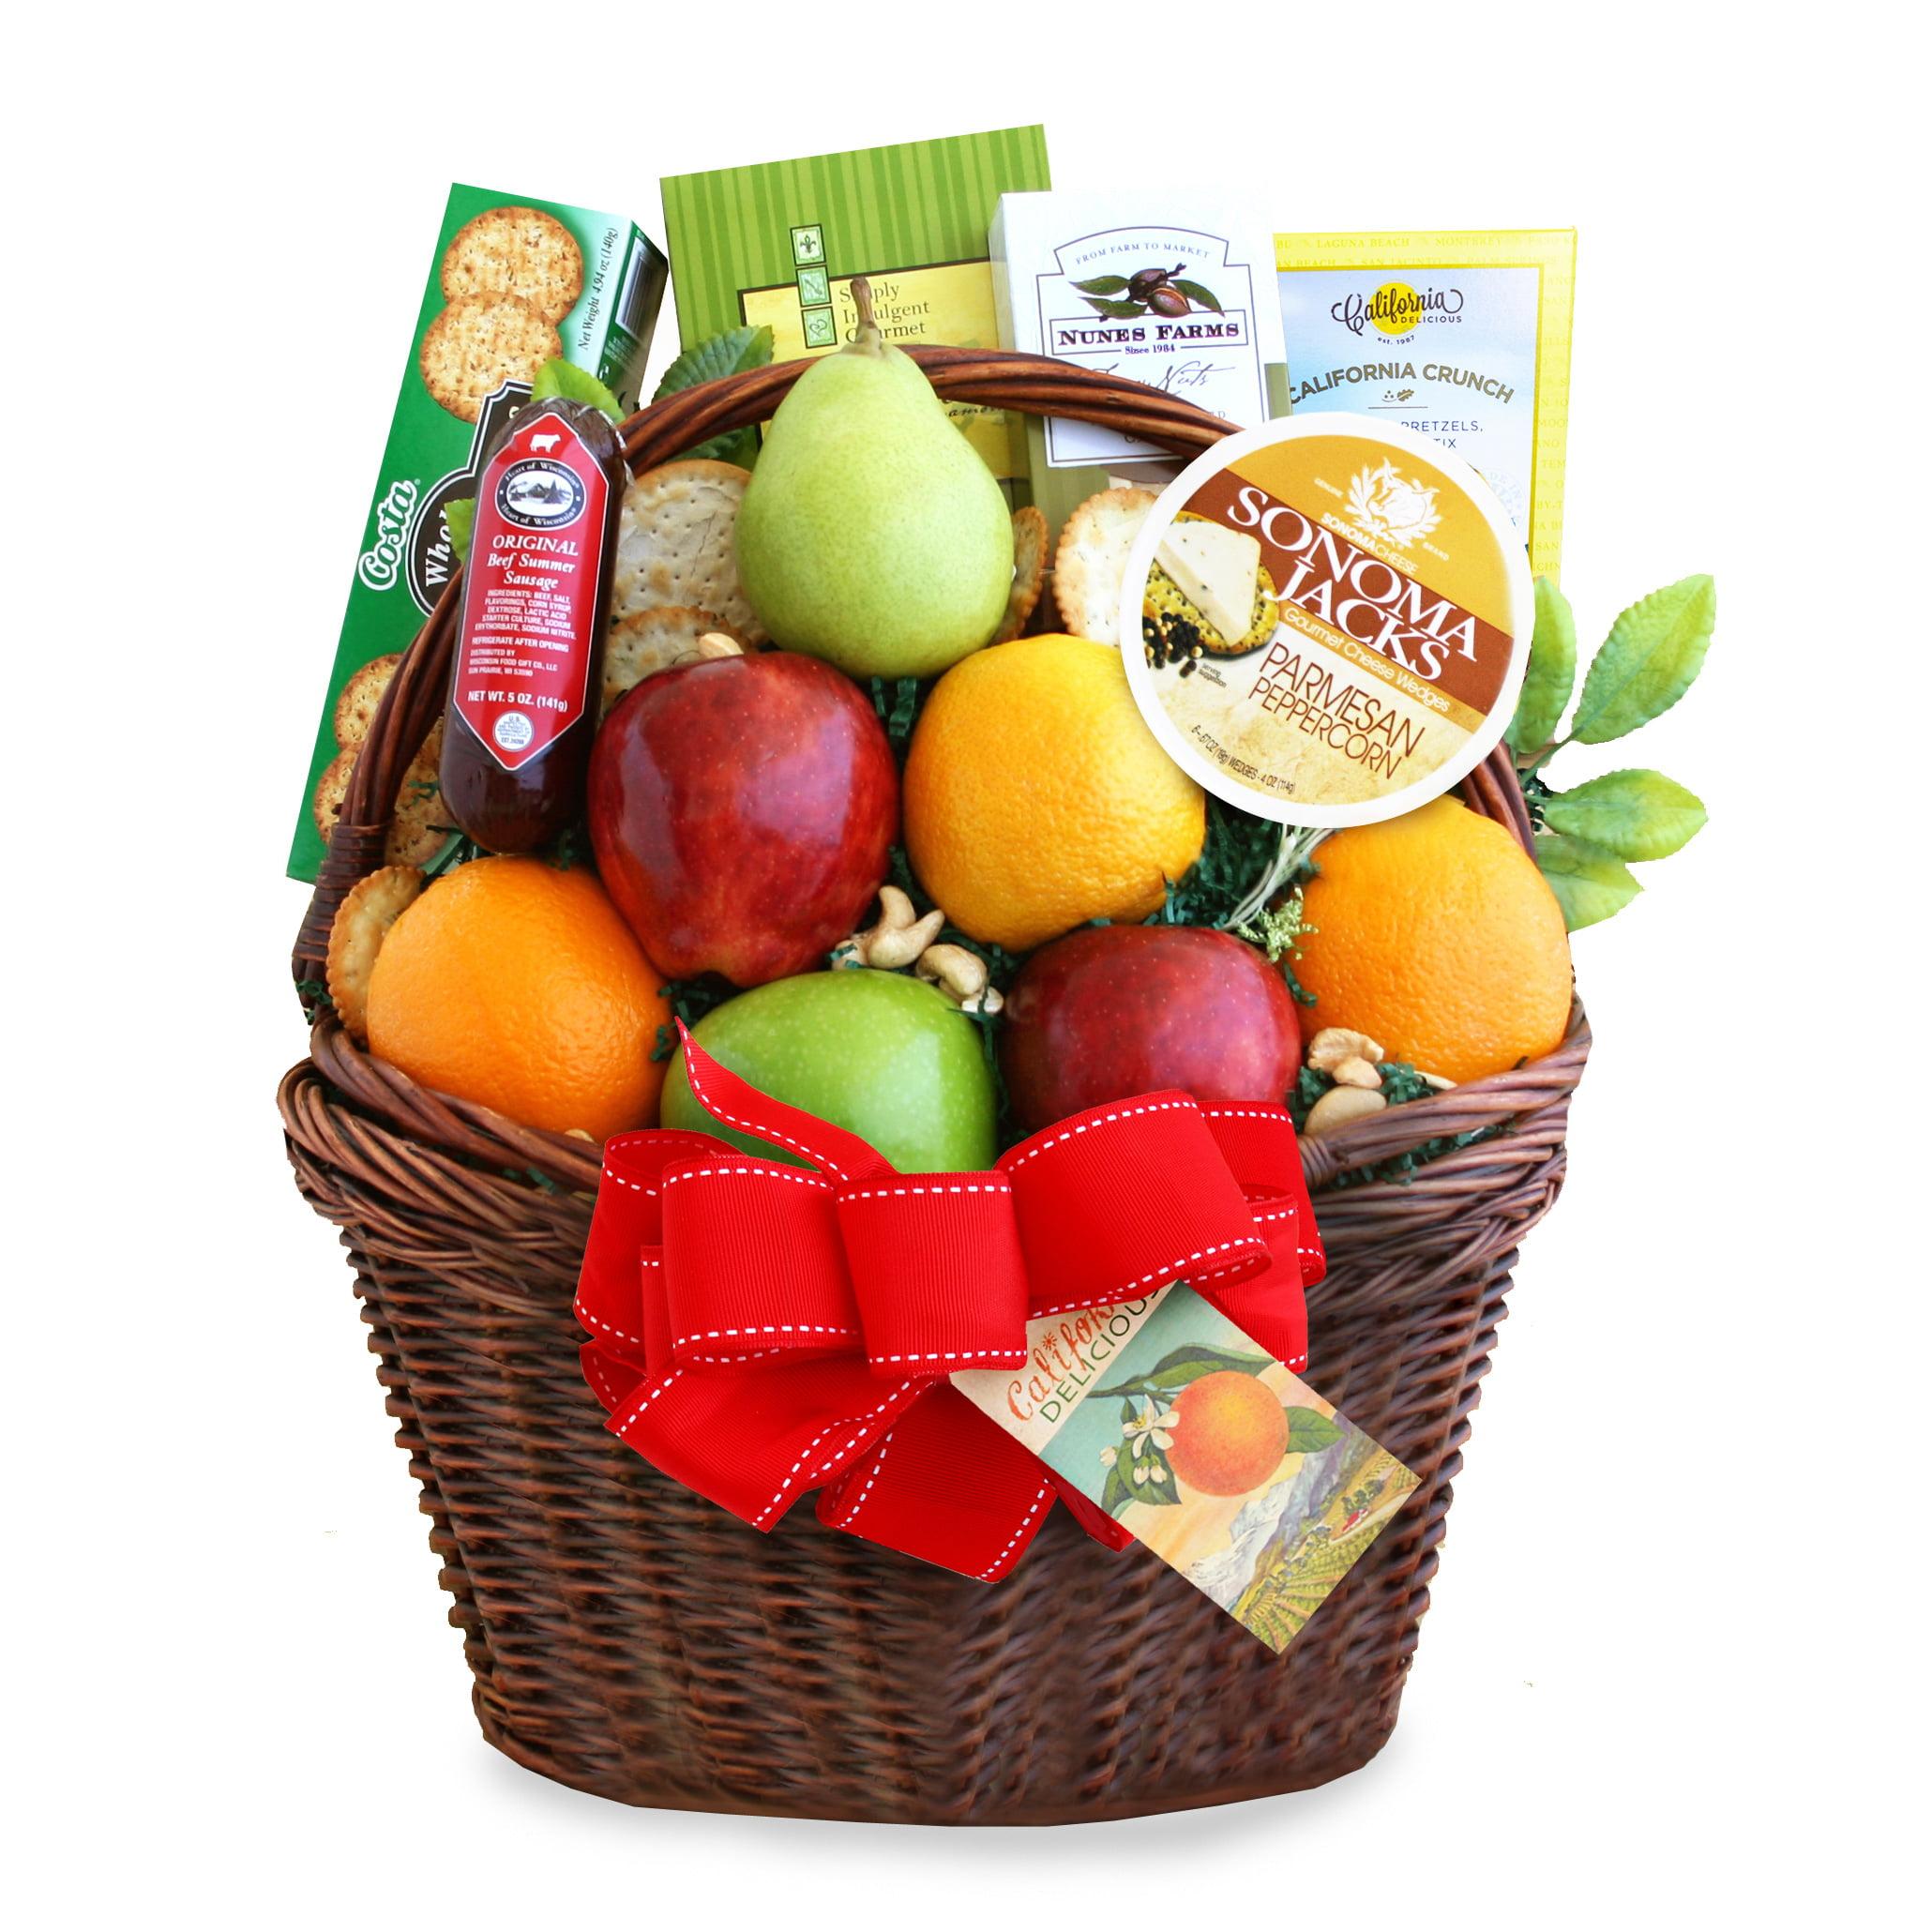 California Delicious Bountiful Fruit Basket Gift